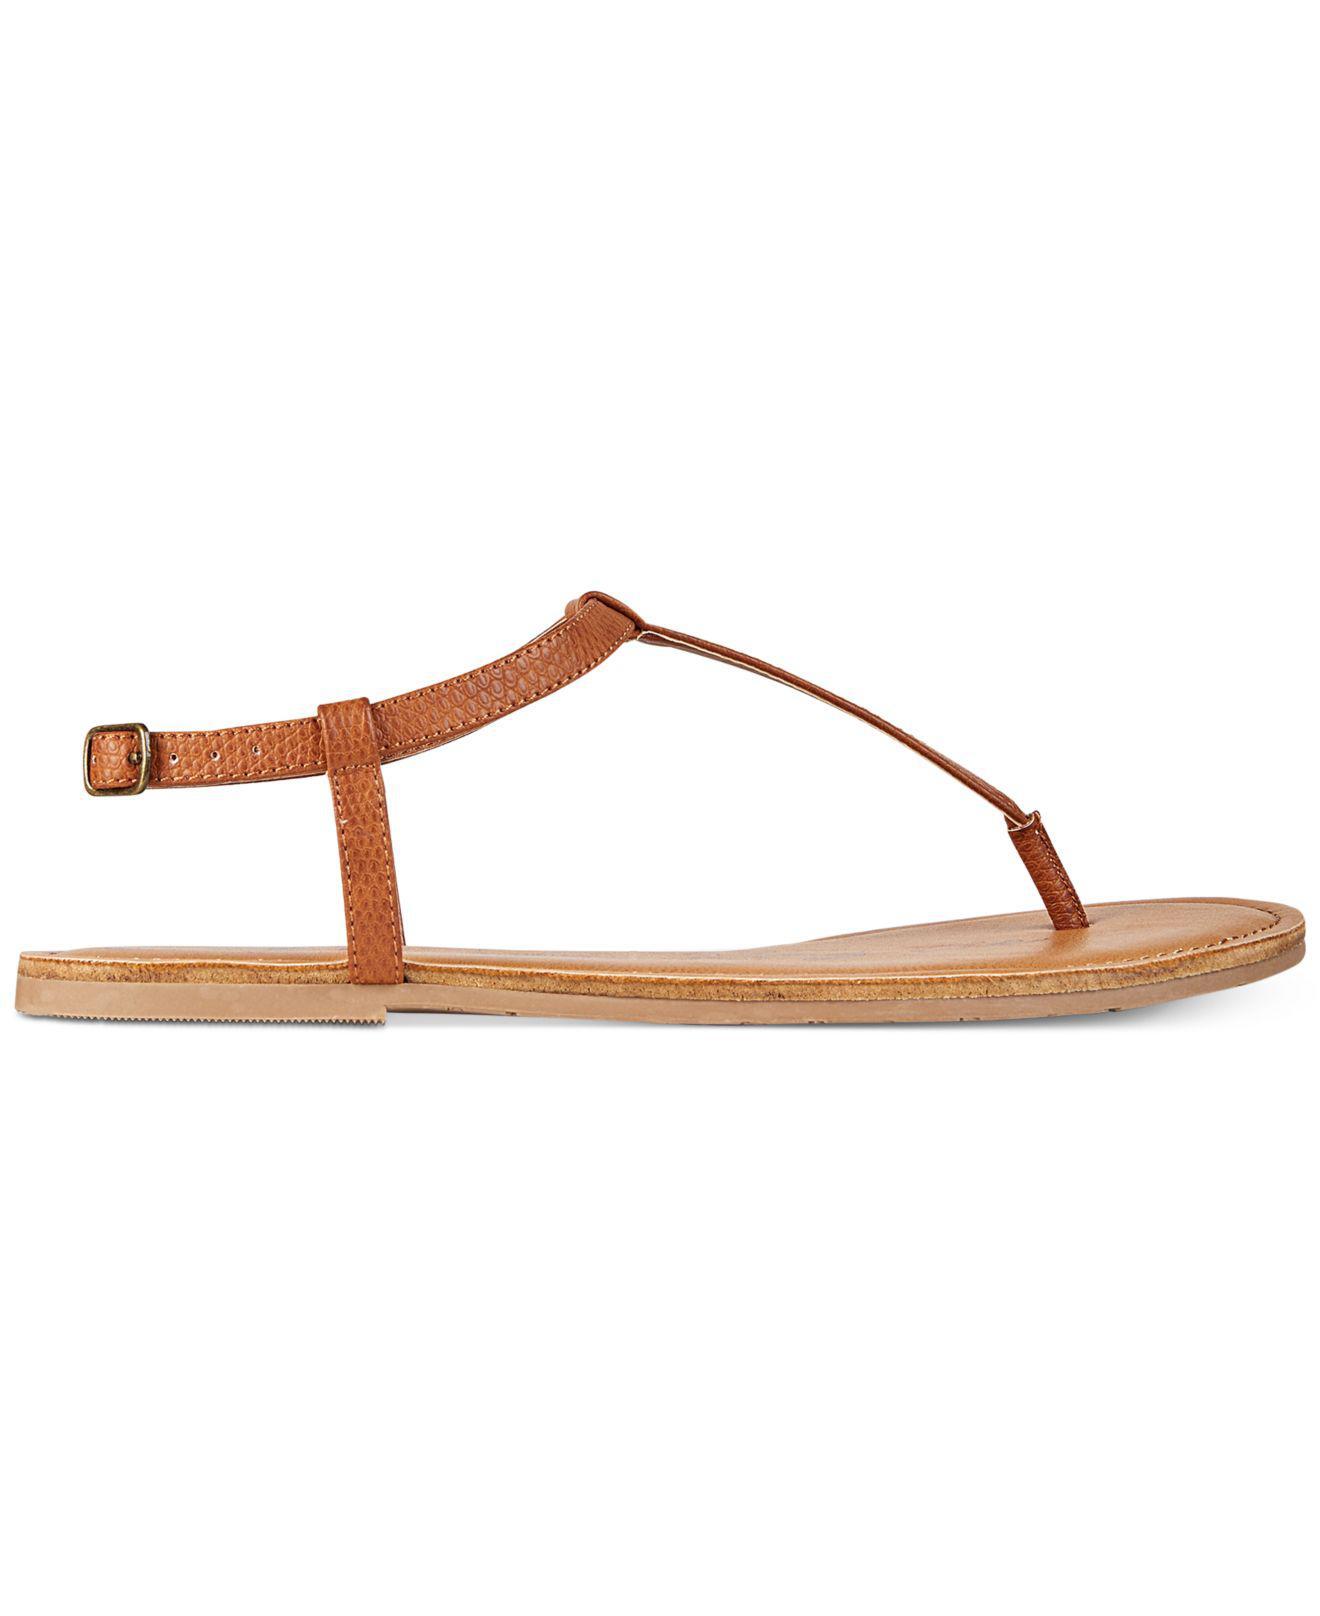 4c345333e2414 Lyst - American Rag Krista T-strap Flat Sandals in Natural